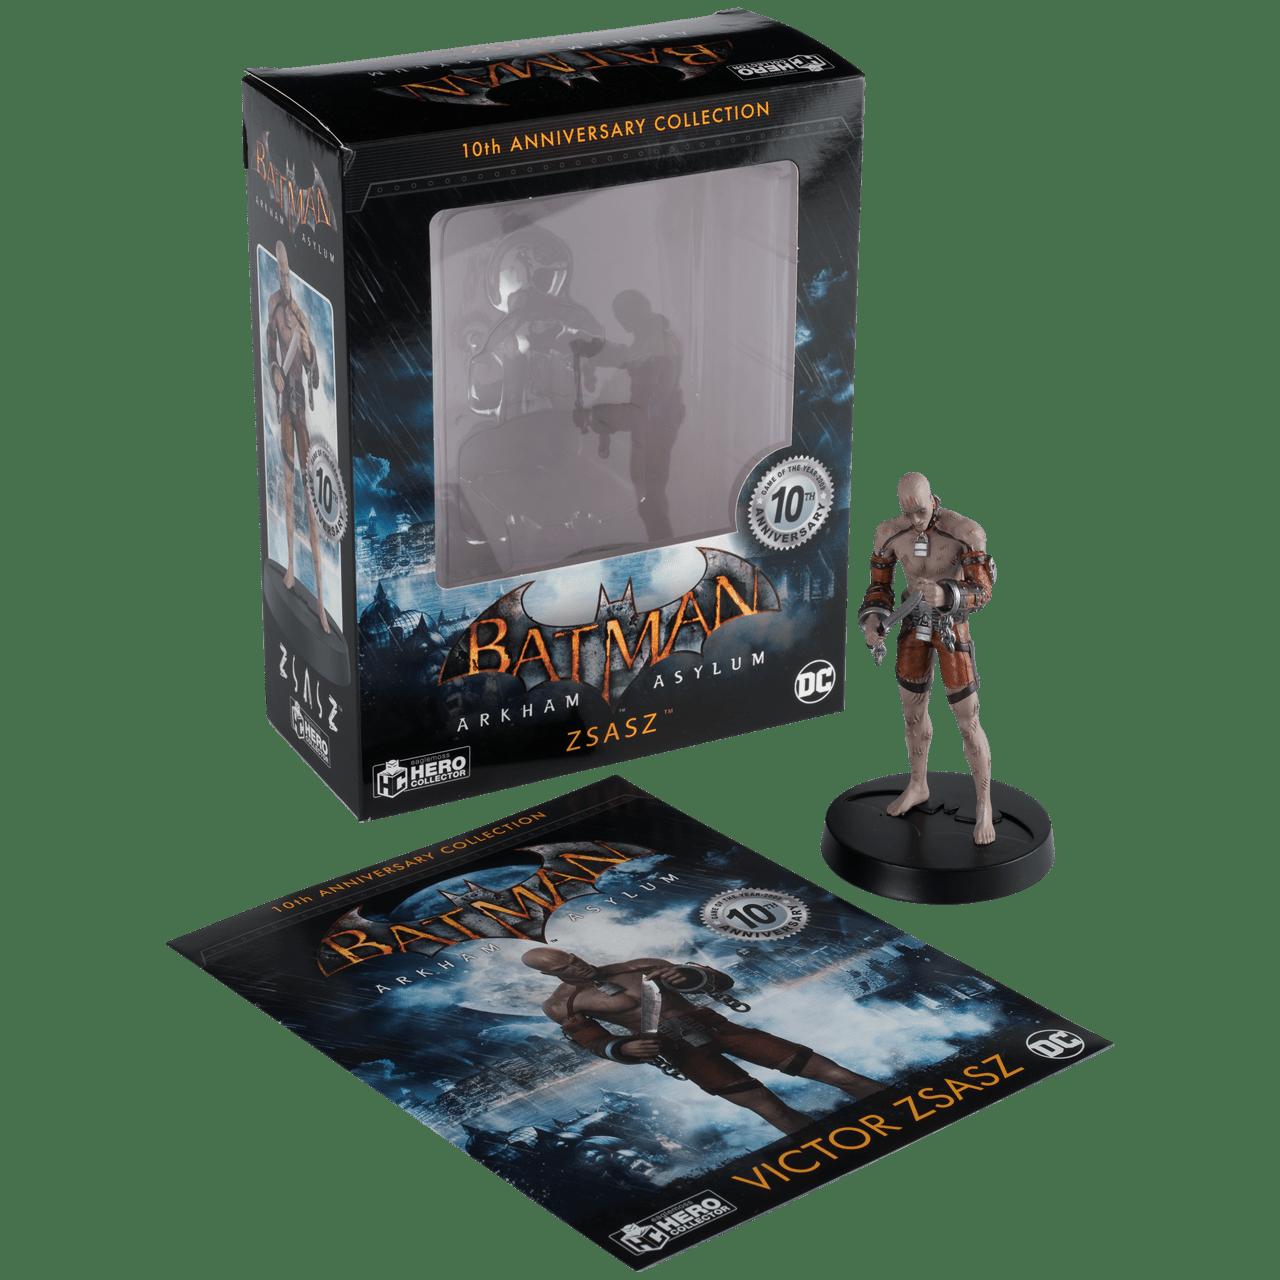 Zsasz Batman Arkham Asylum 1:16 Figurine With Magazine: Hero Collector - 4